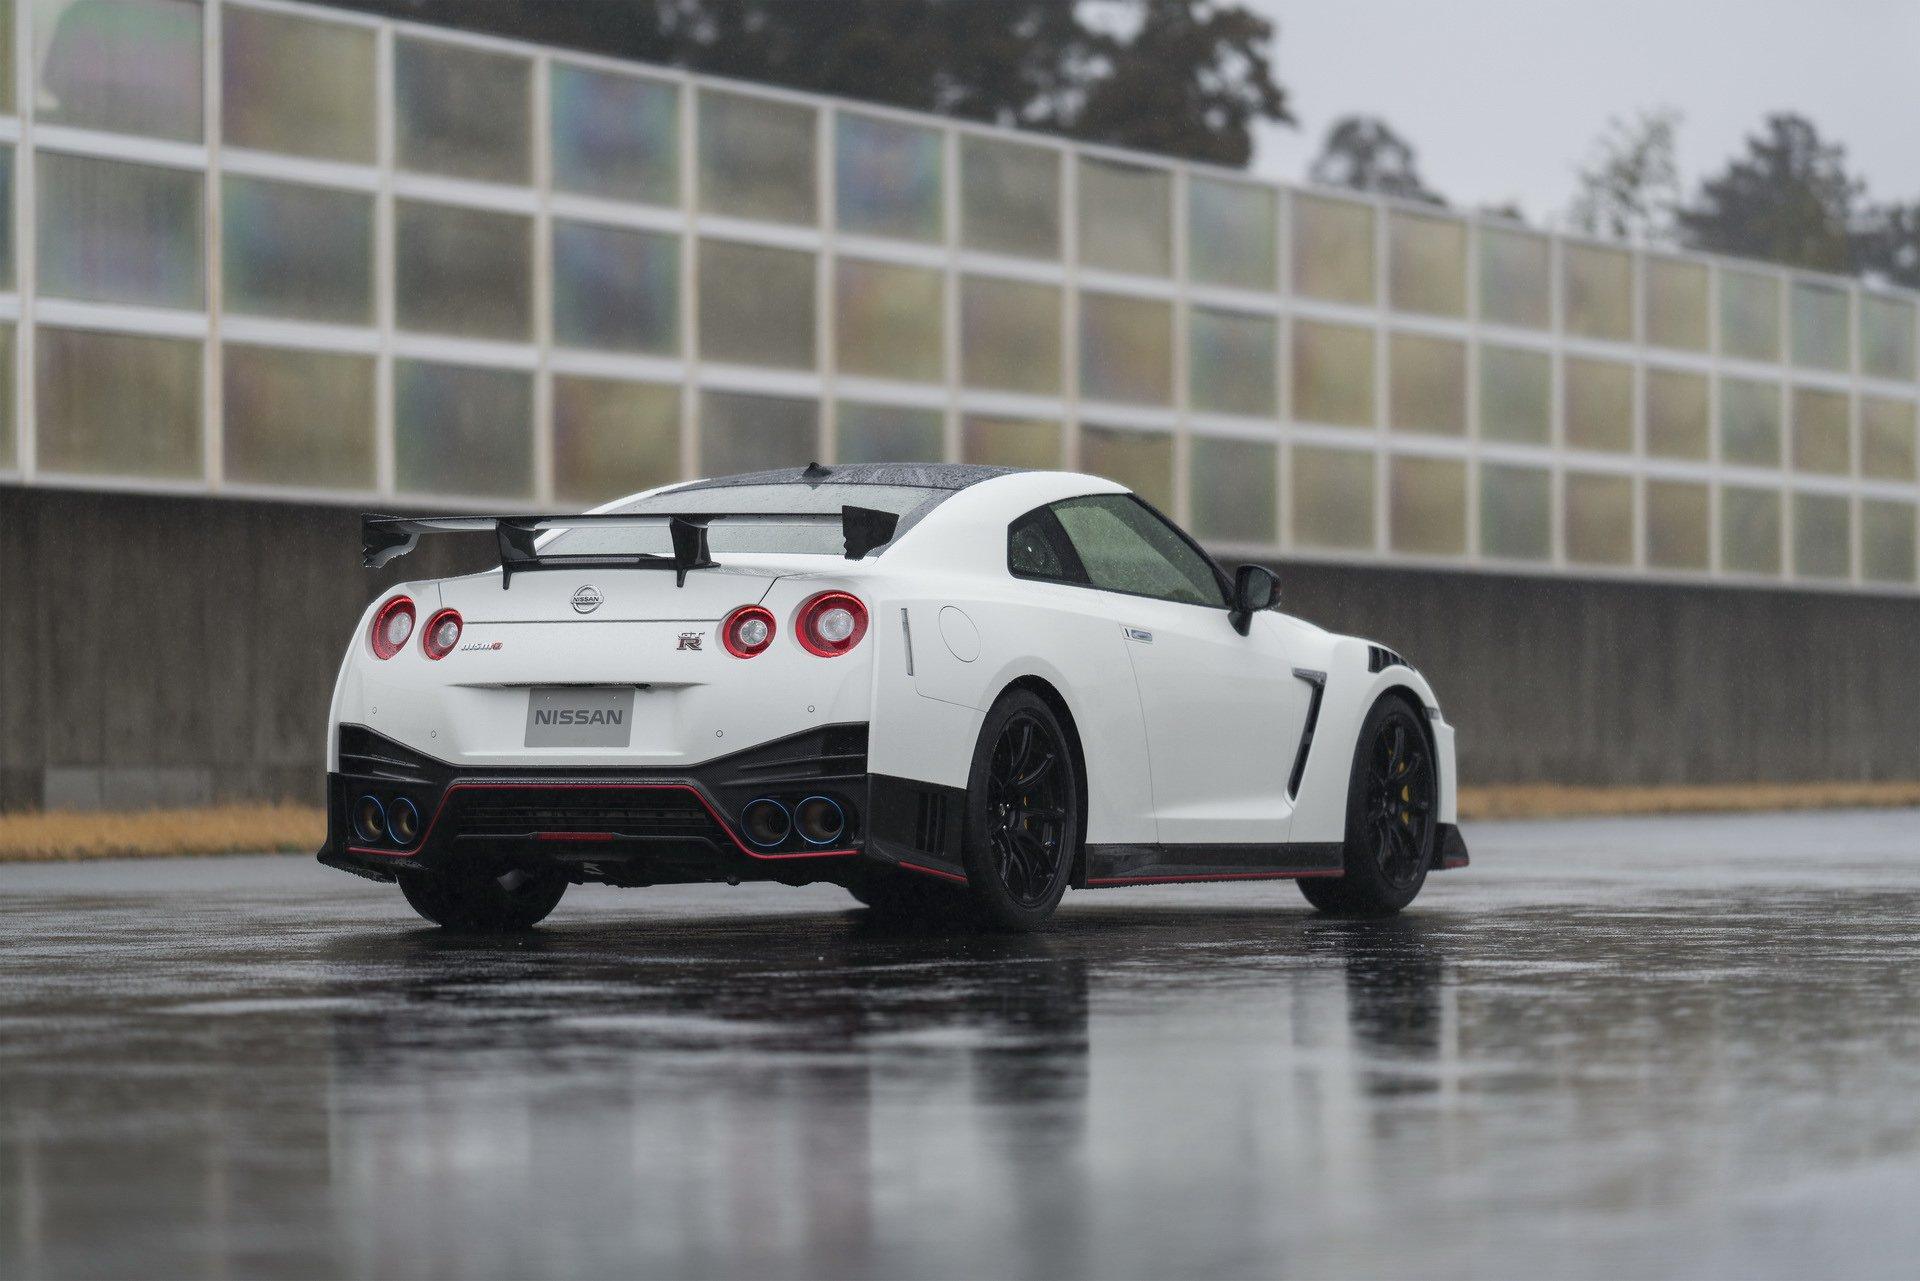 Nissan-GT-R-Nismo-2020-7